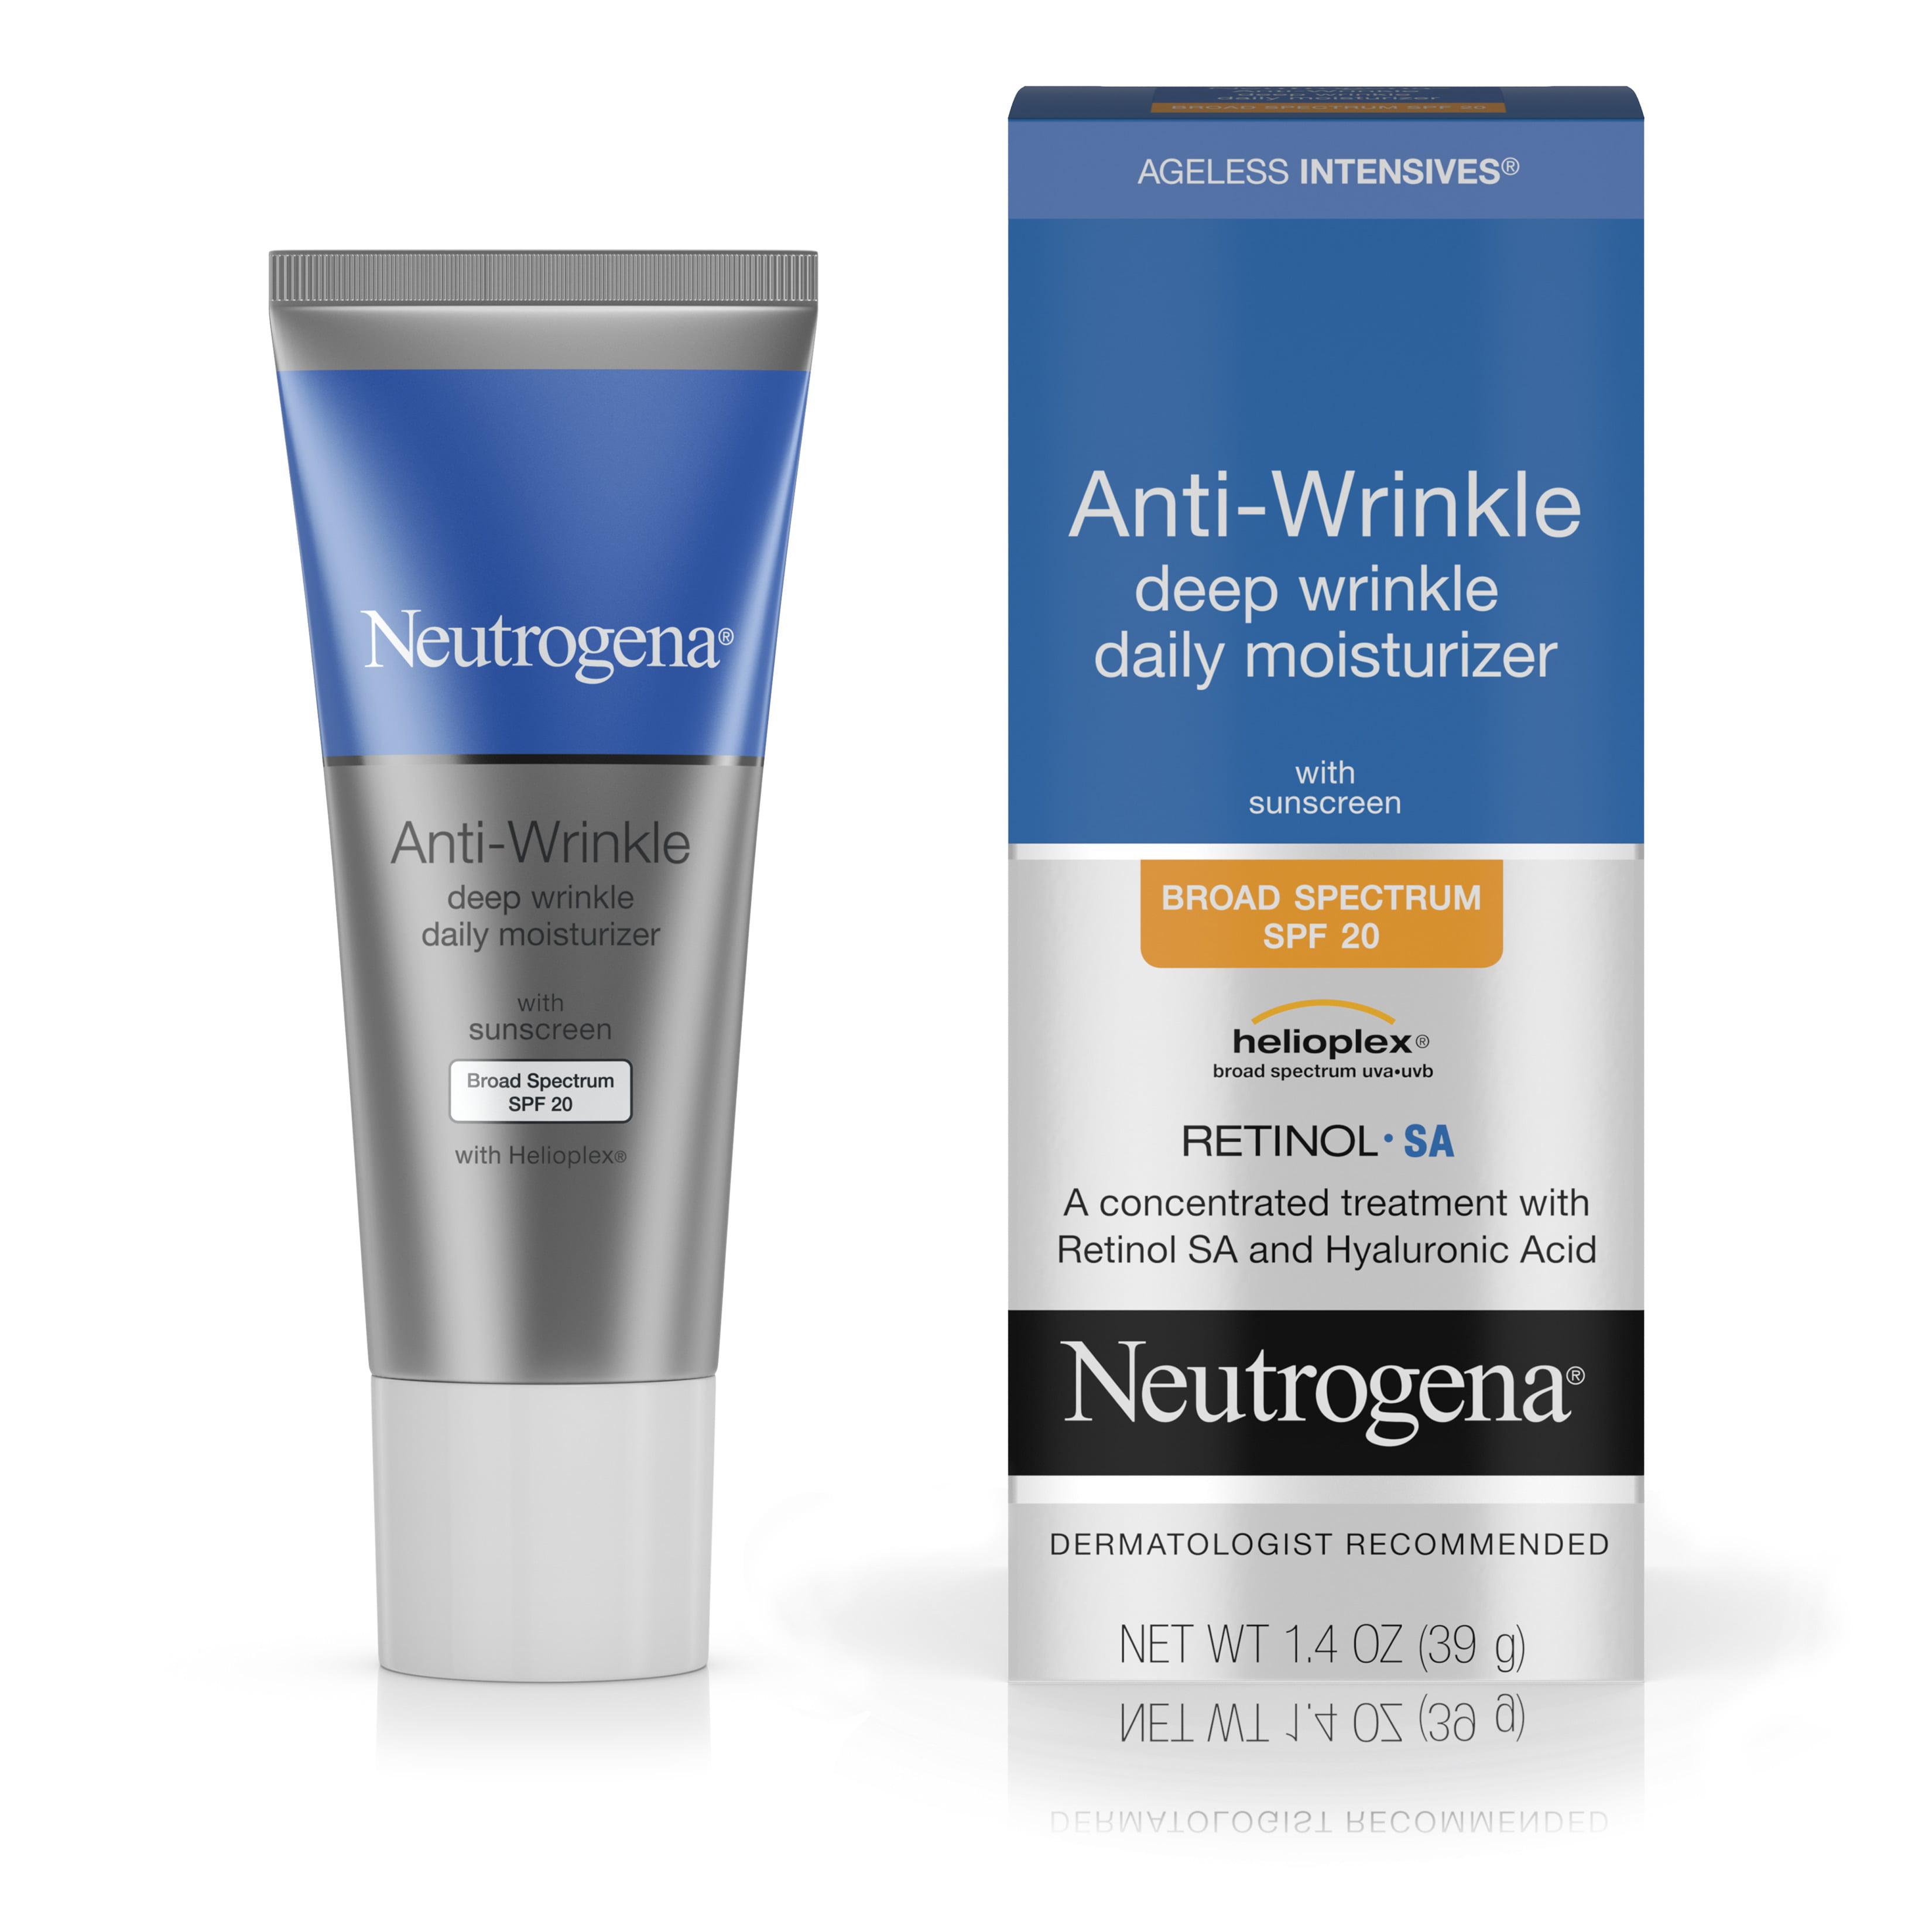 Neutrogena Ageless Intensives Anti-Wrinkle Moisturizer SPF 20, 1.4 oz